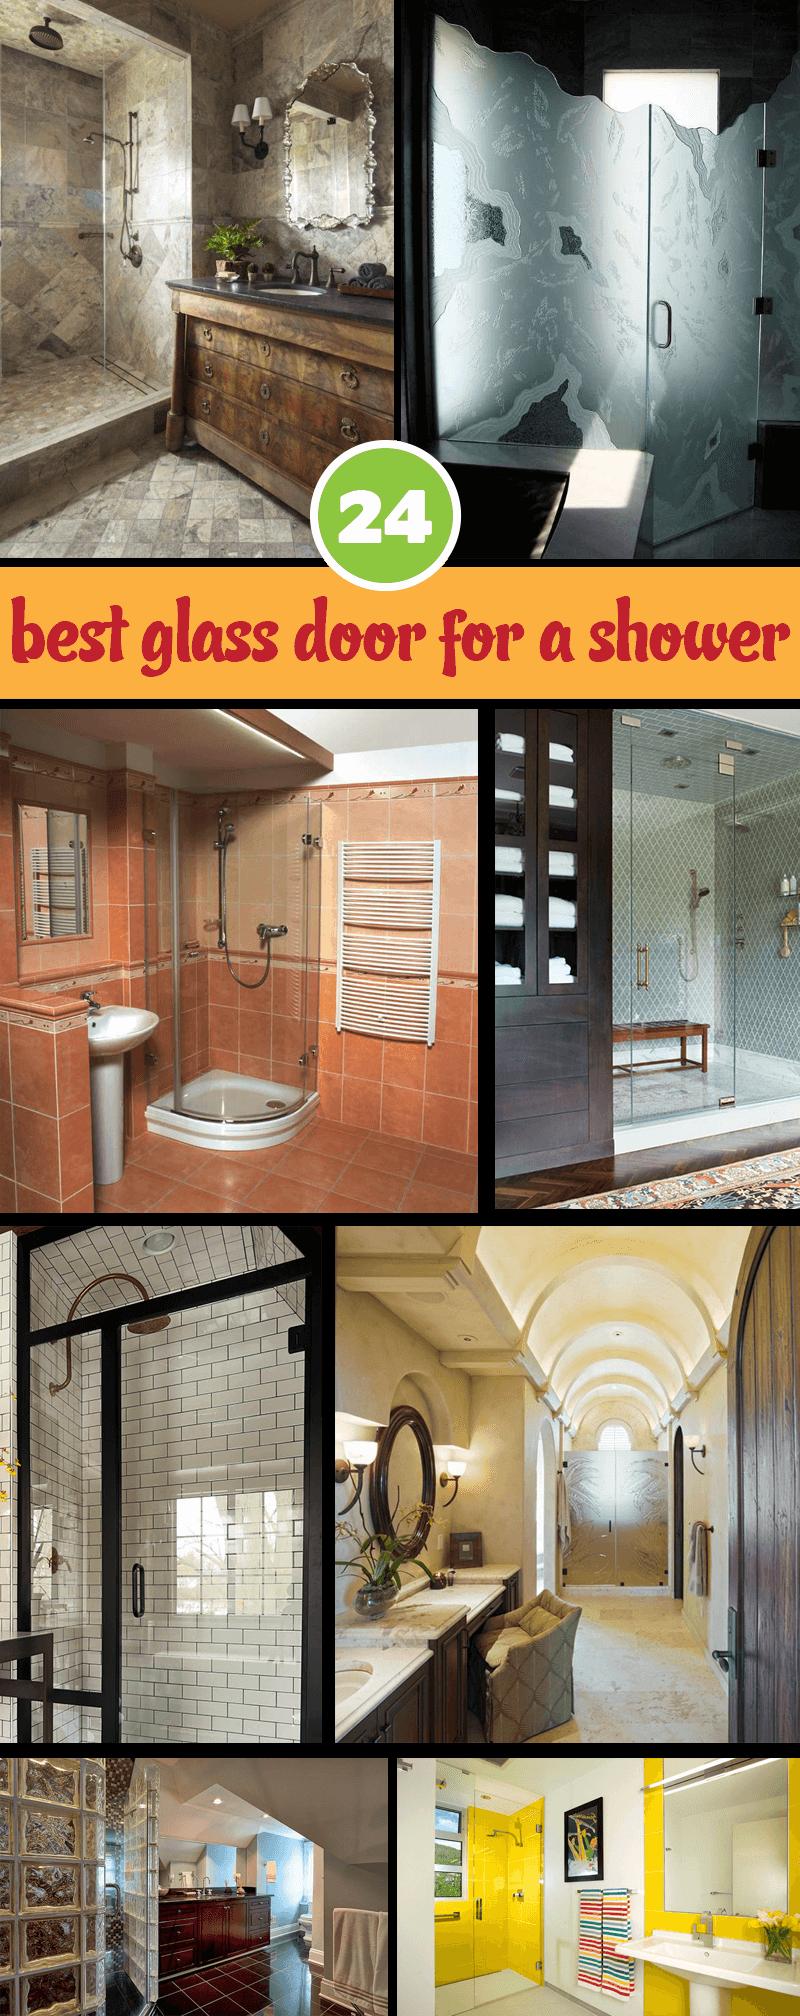 glass door for a shower